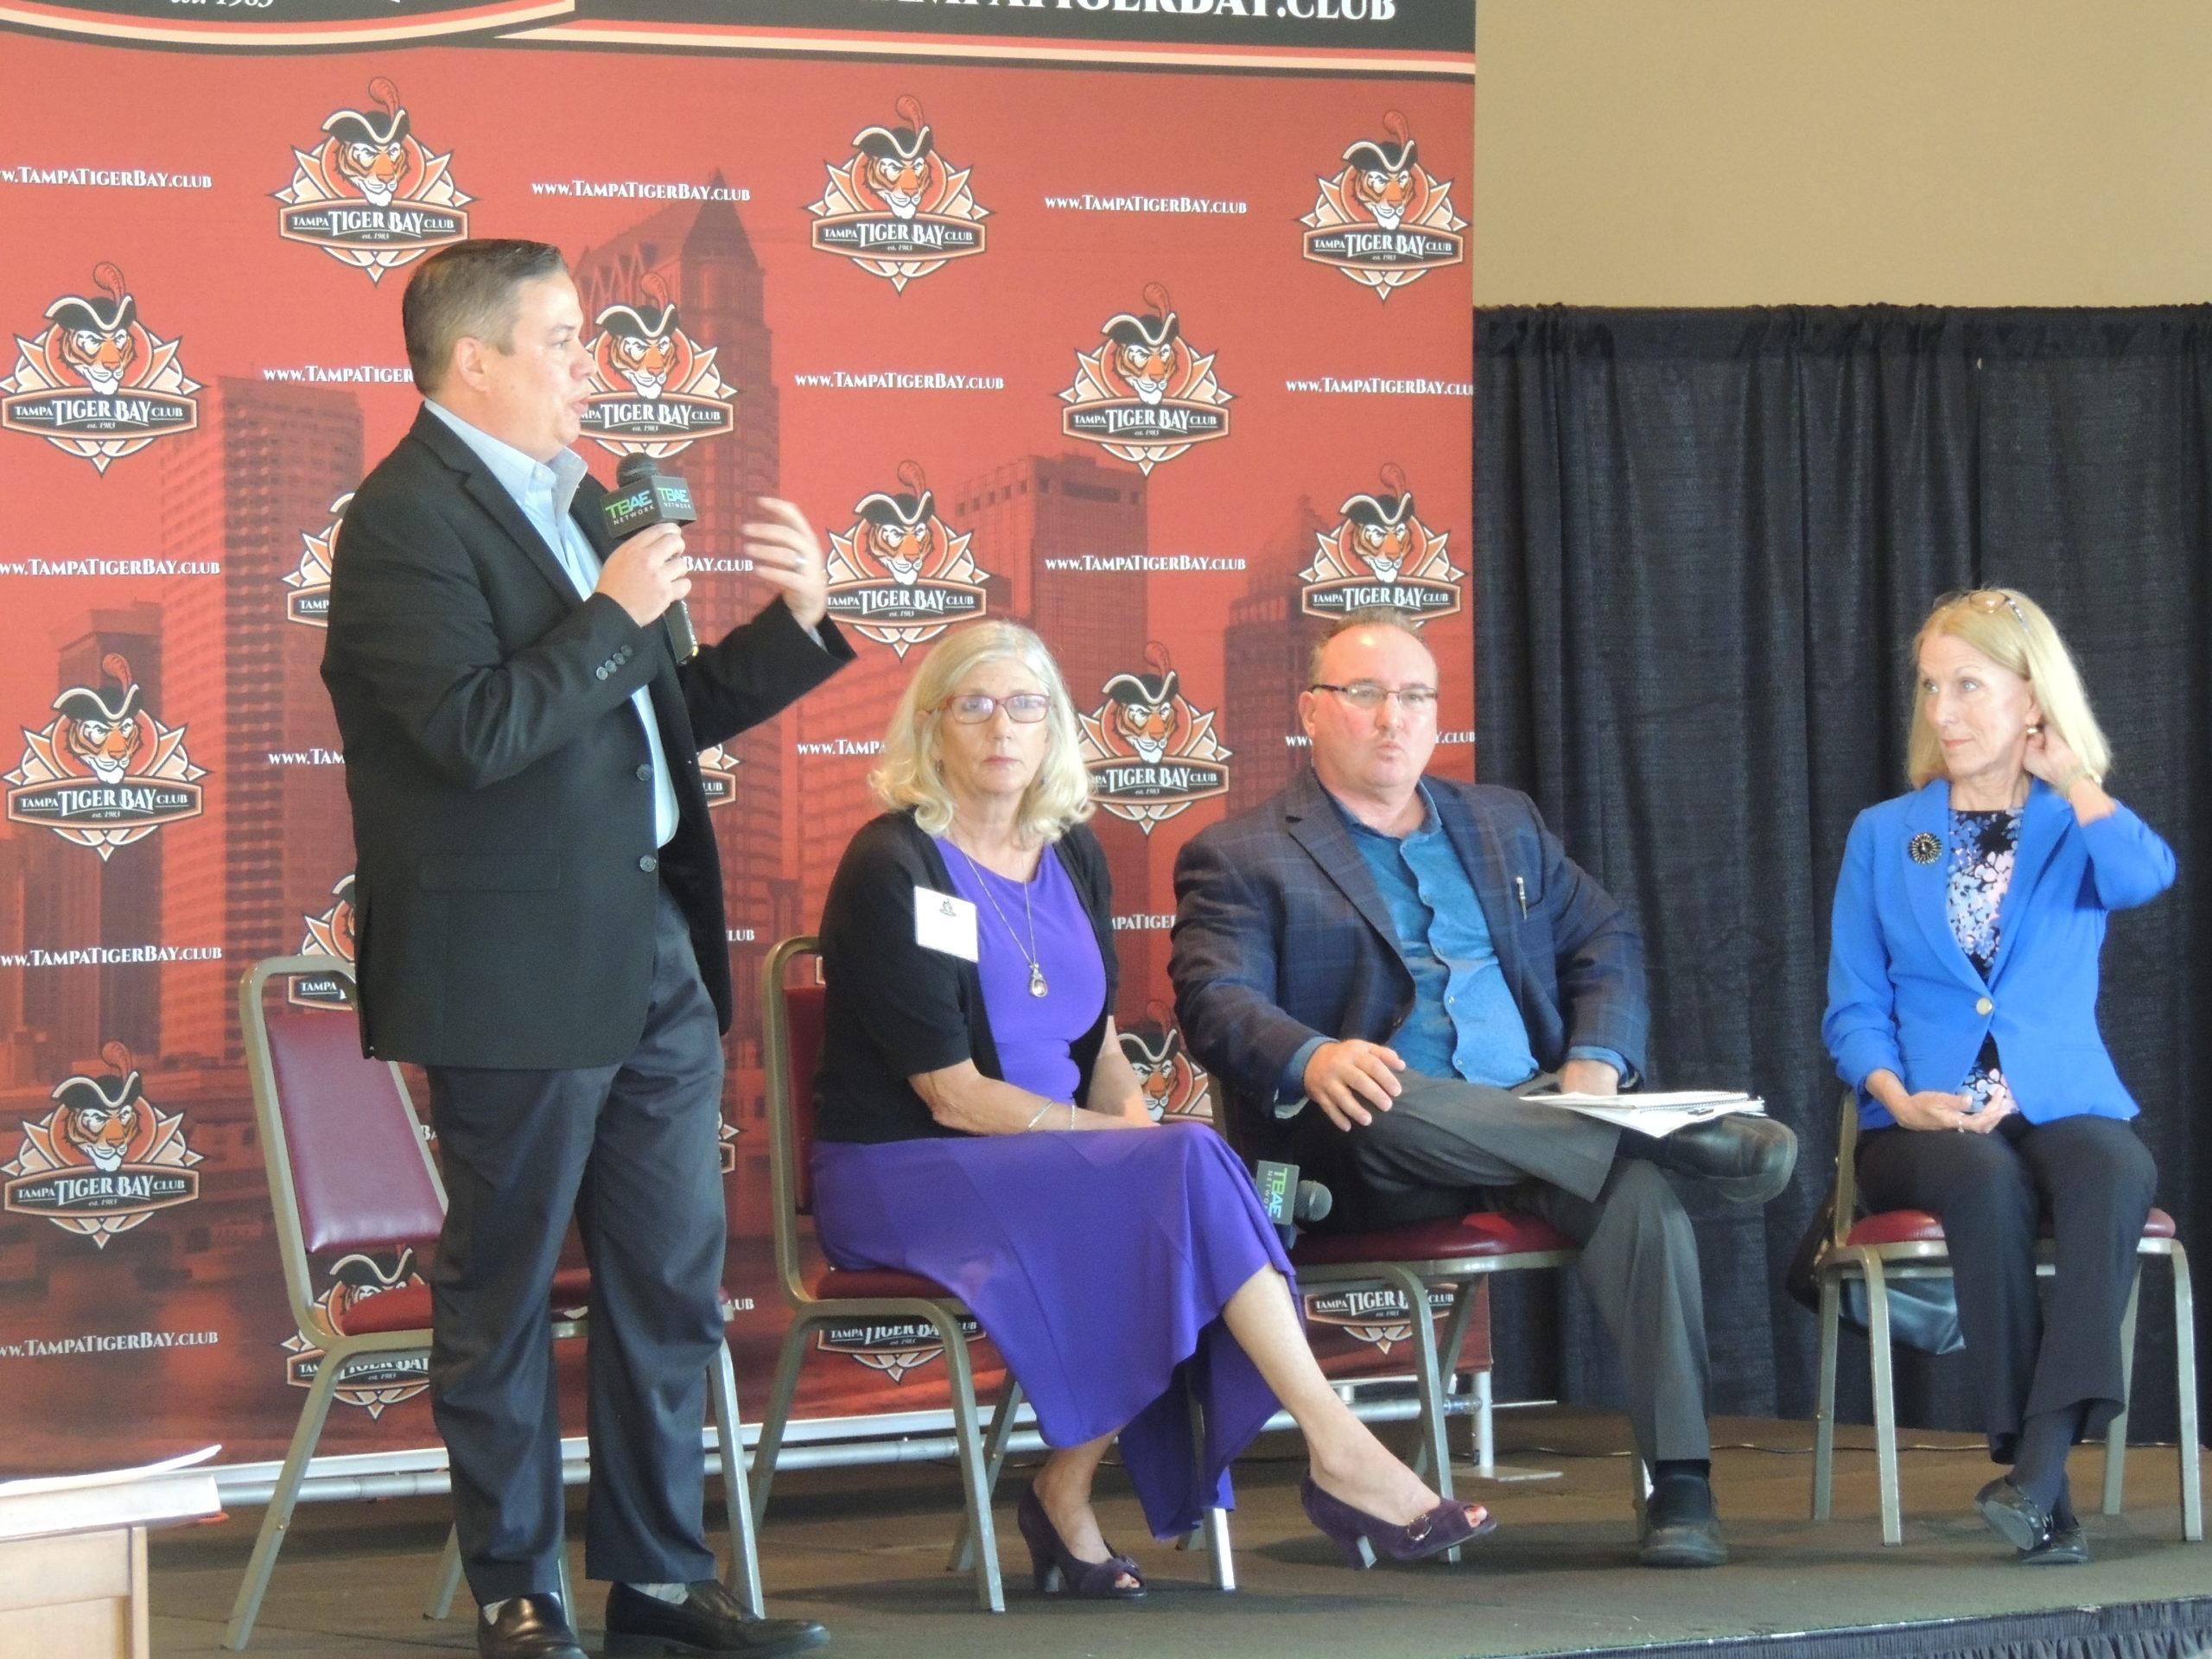 Tiger Bay Forum On Development By Sean Kinane WMNF